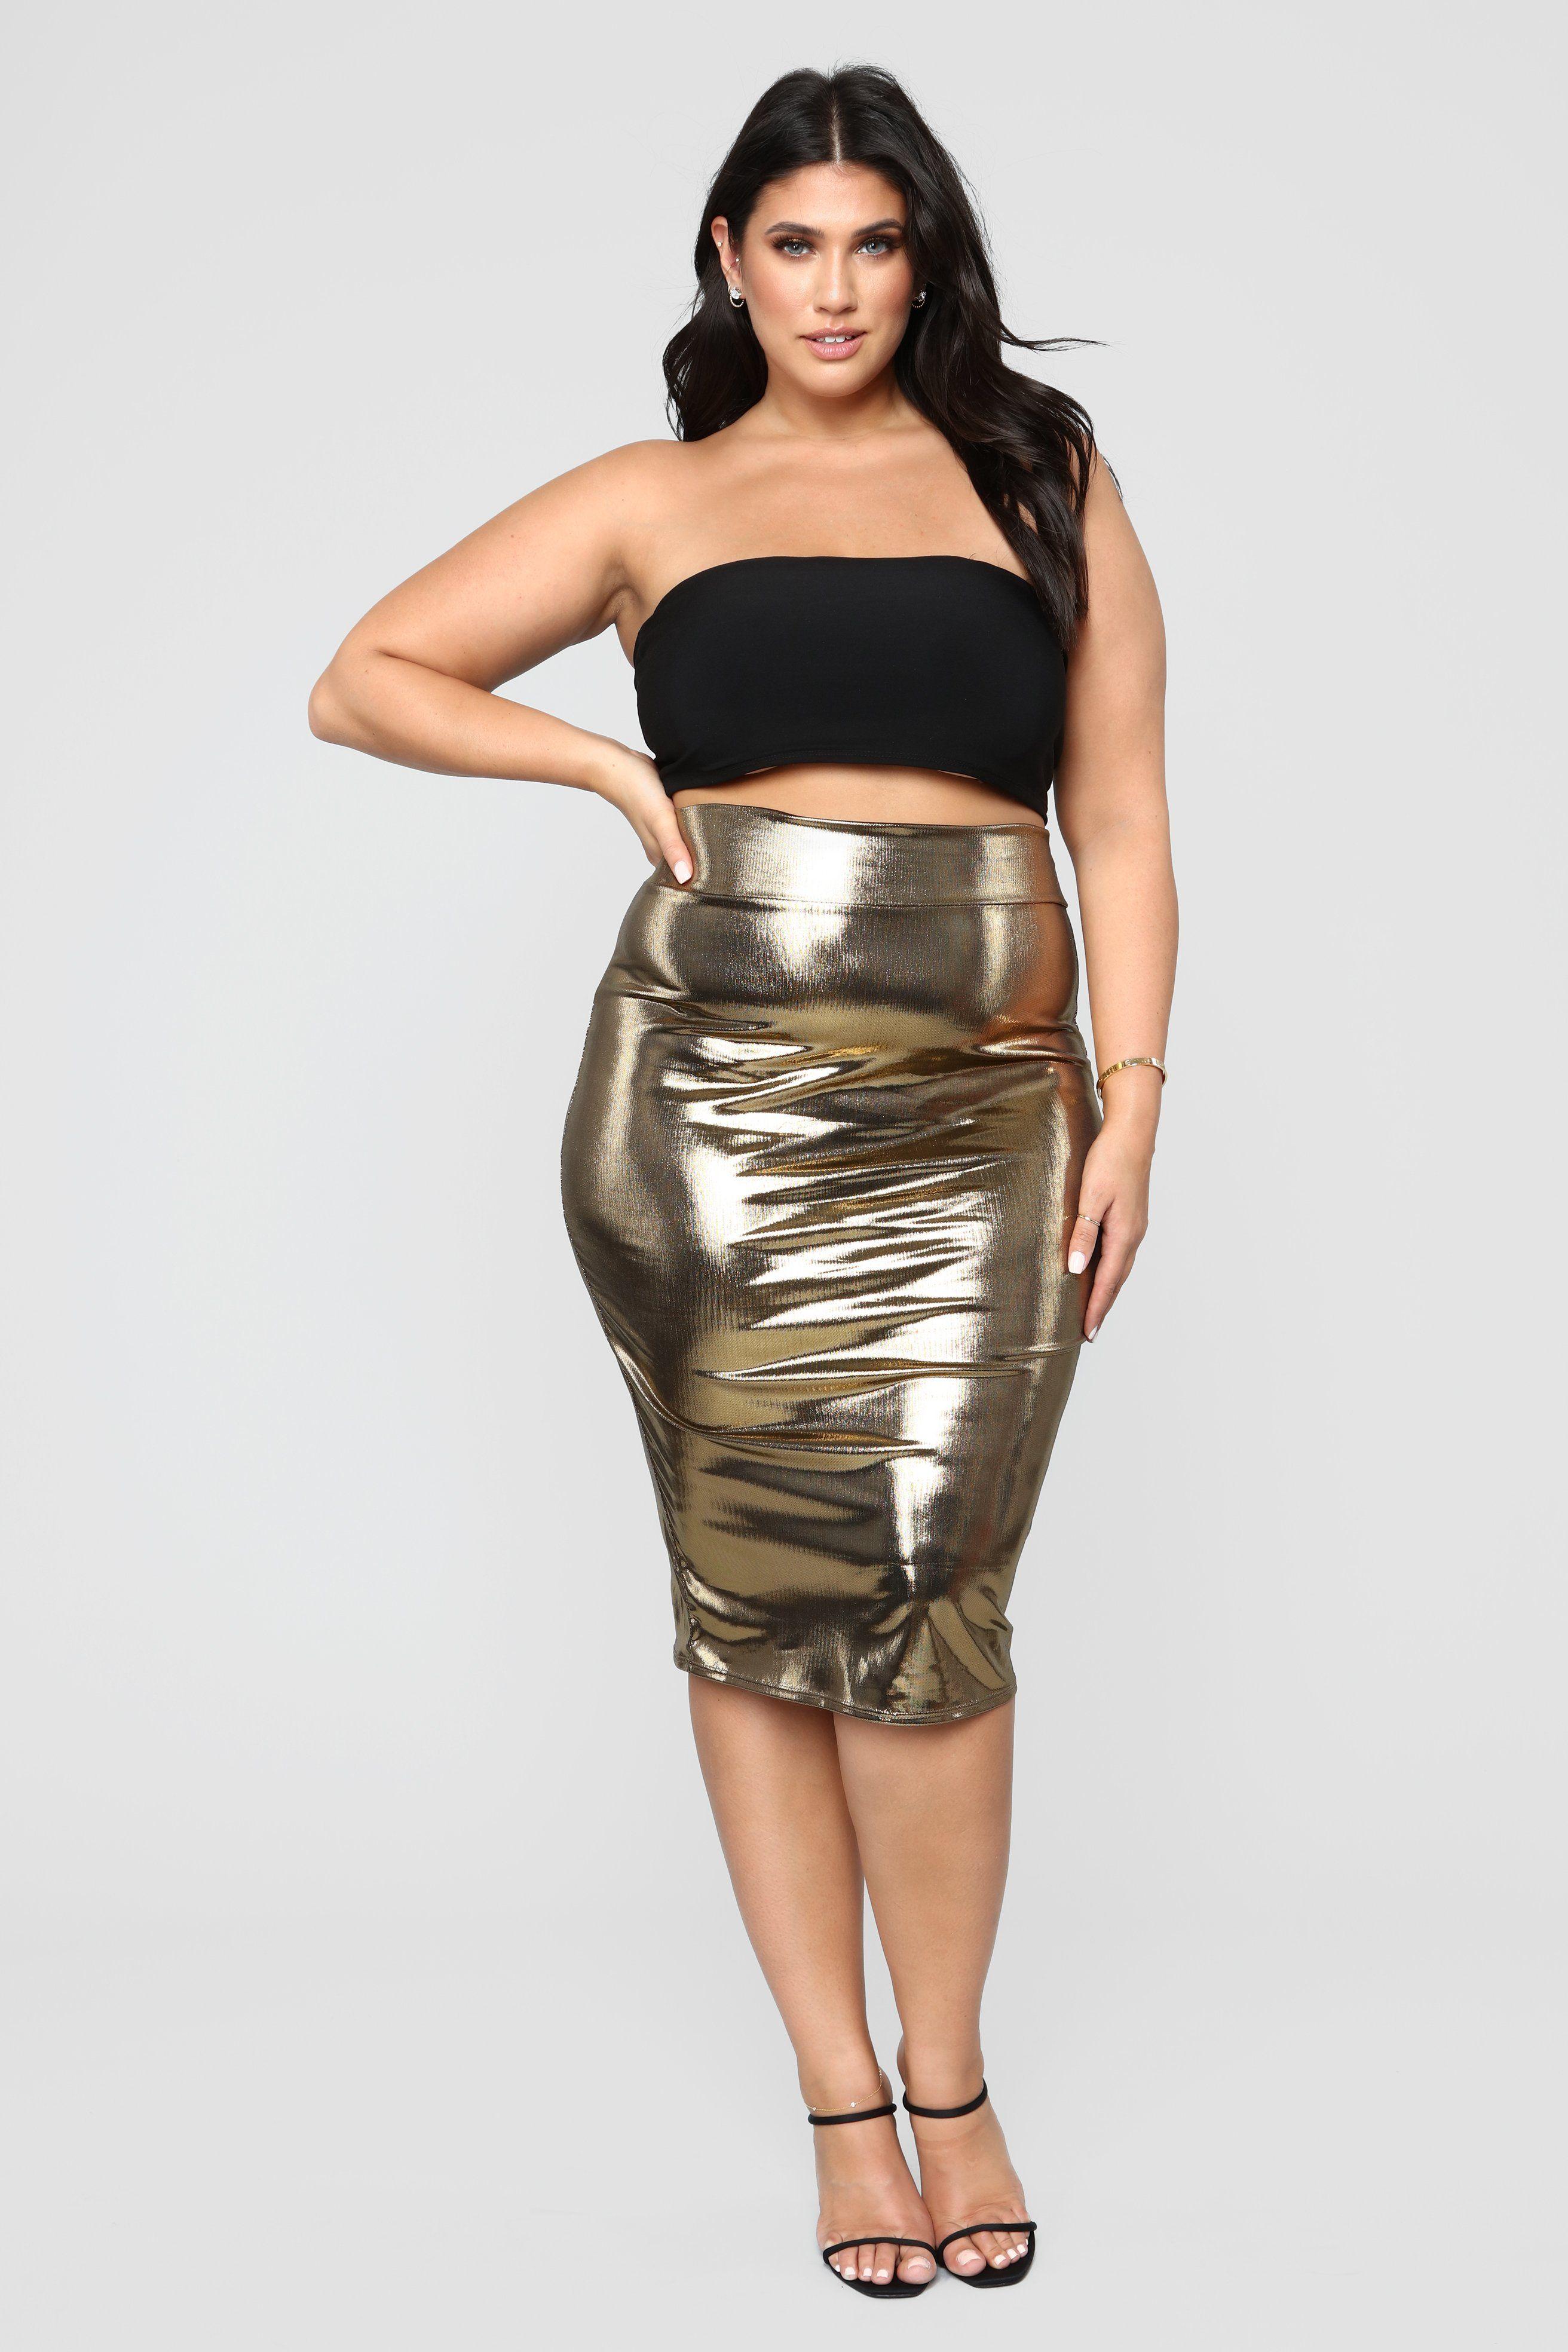 5d77fcfaa2 Plus Size Girls, Heart Of Gold, Midi Skirt, Two Piece Skirt Set,